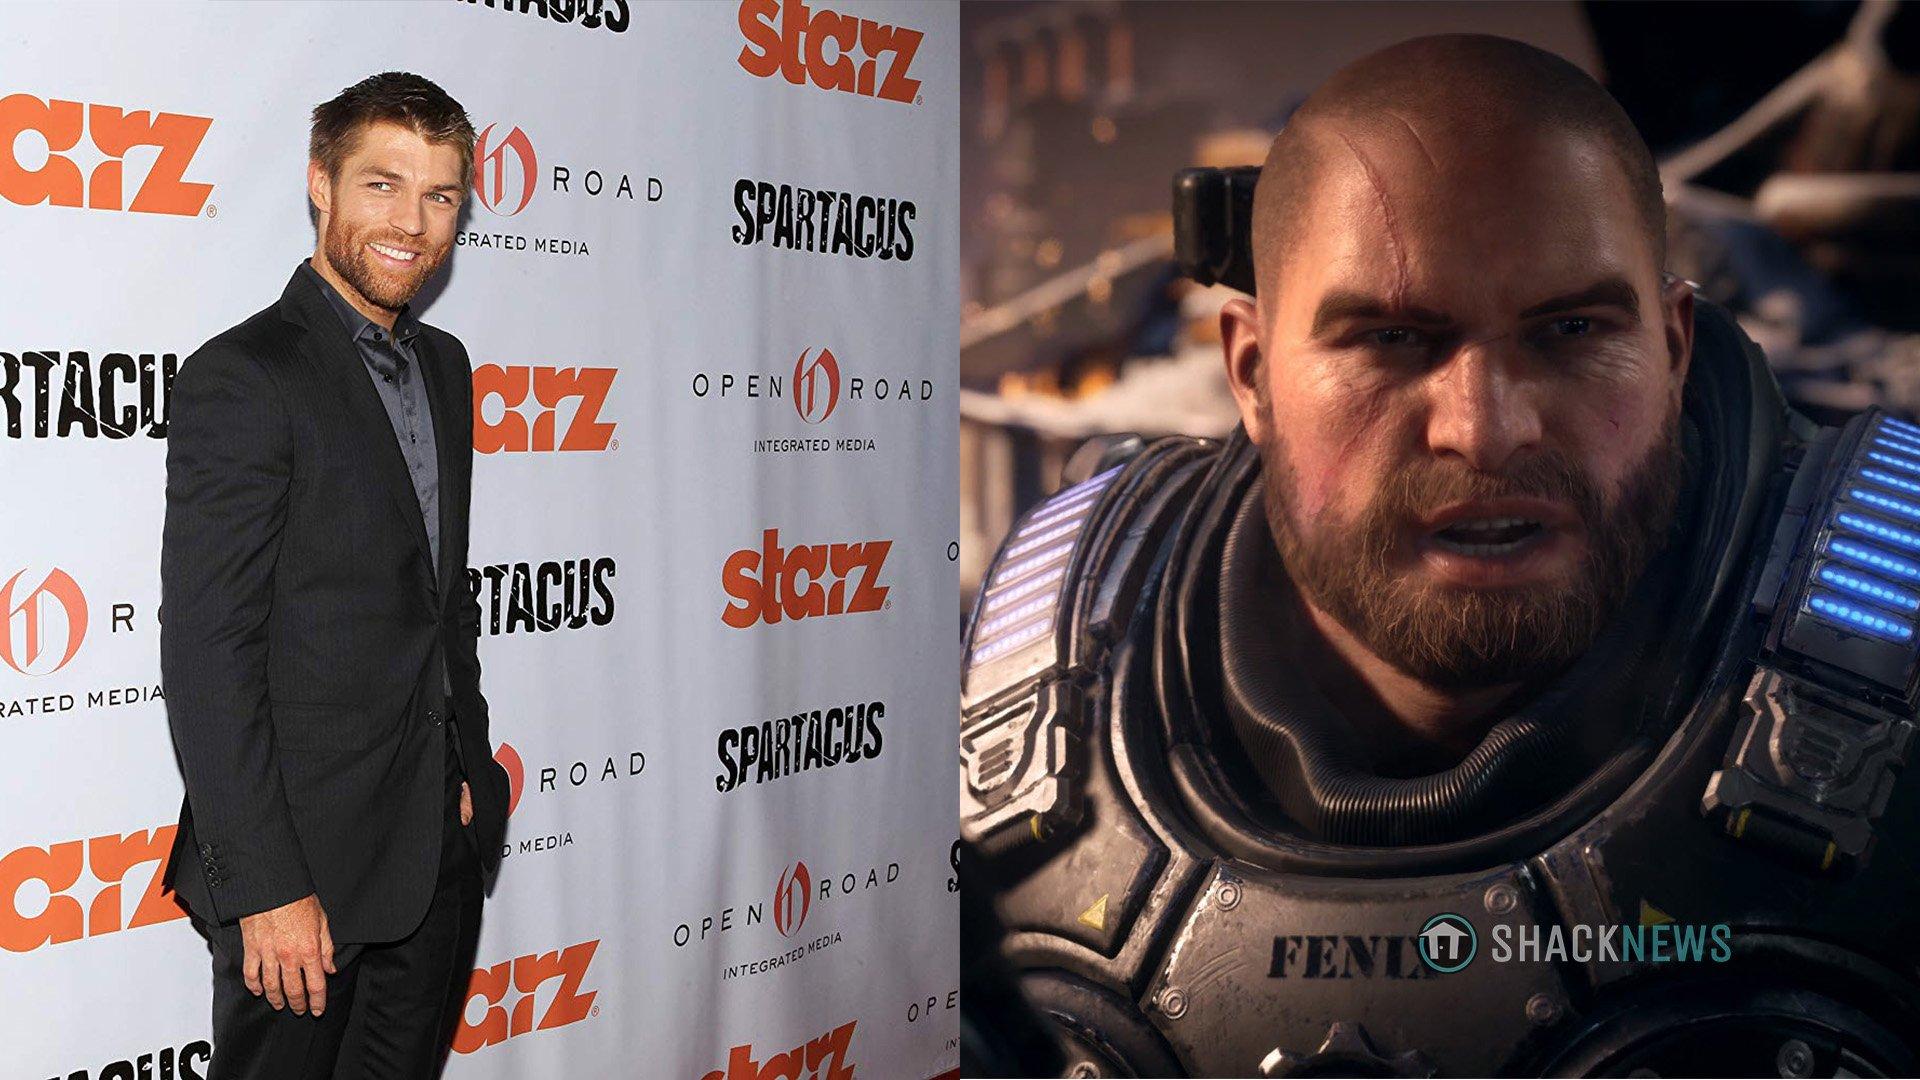 Gears 5 - J.D. Fenix voice actor